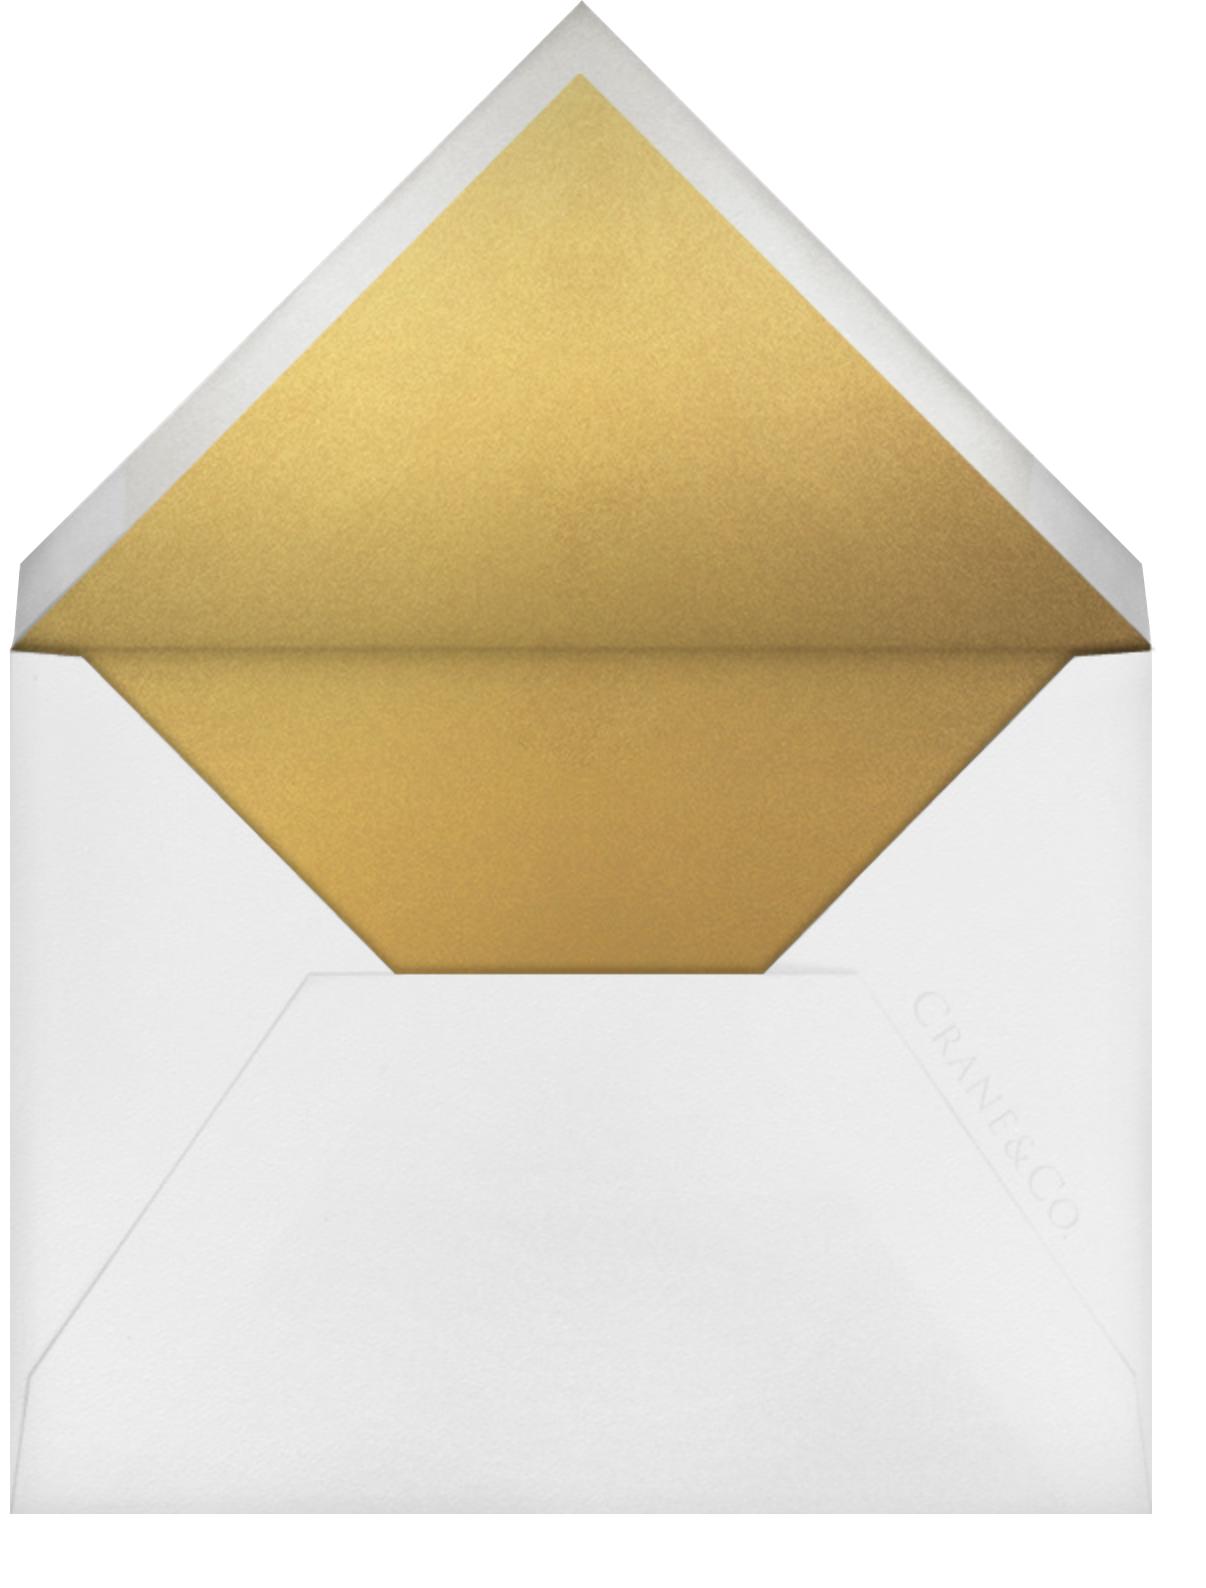 Lancet - Gold - Vera Wang - Engagement party - envelope back